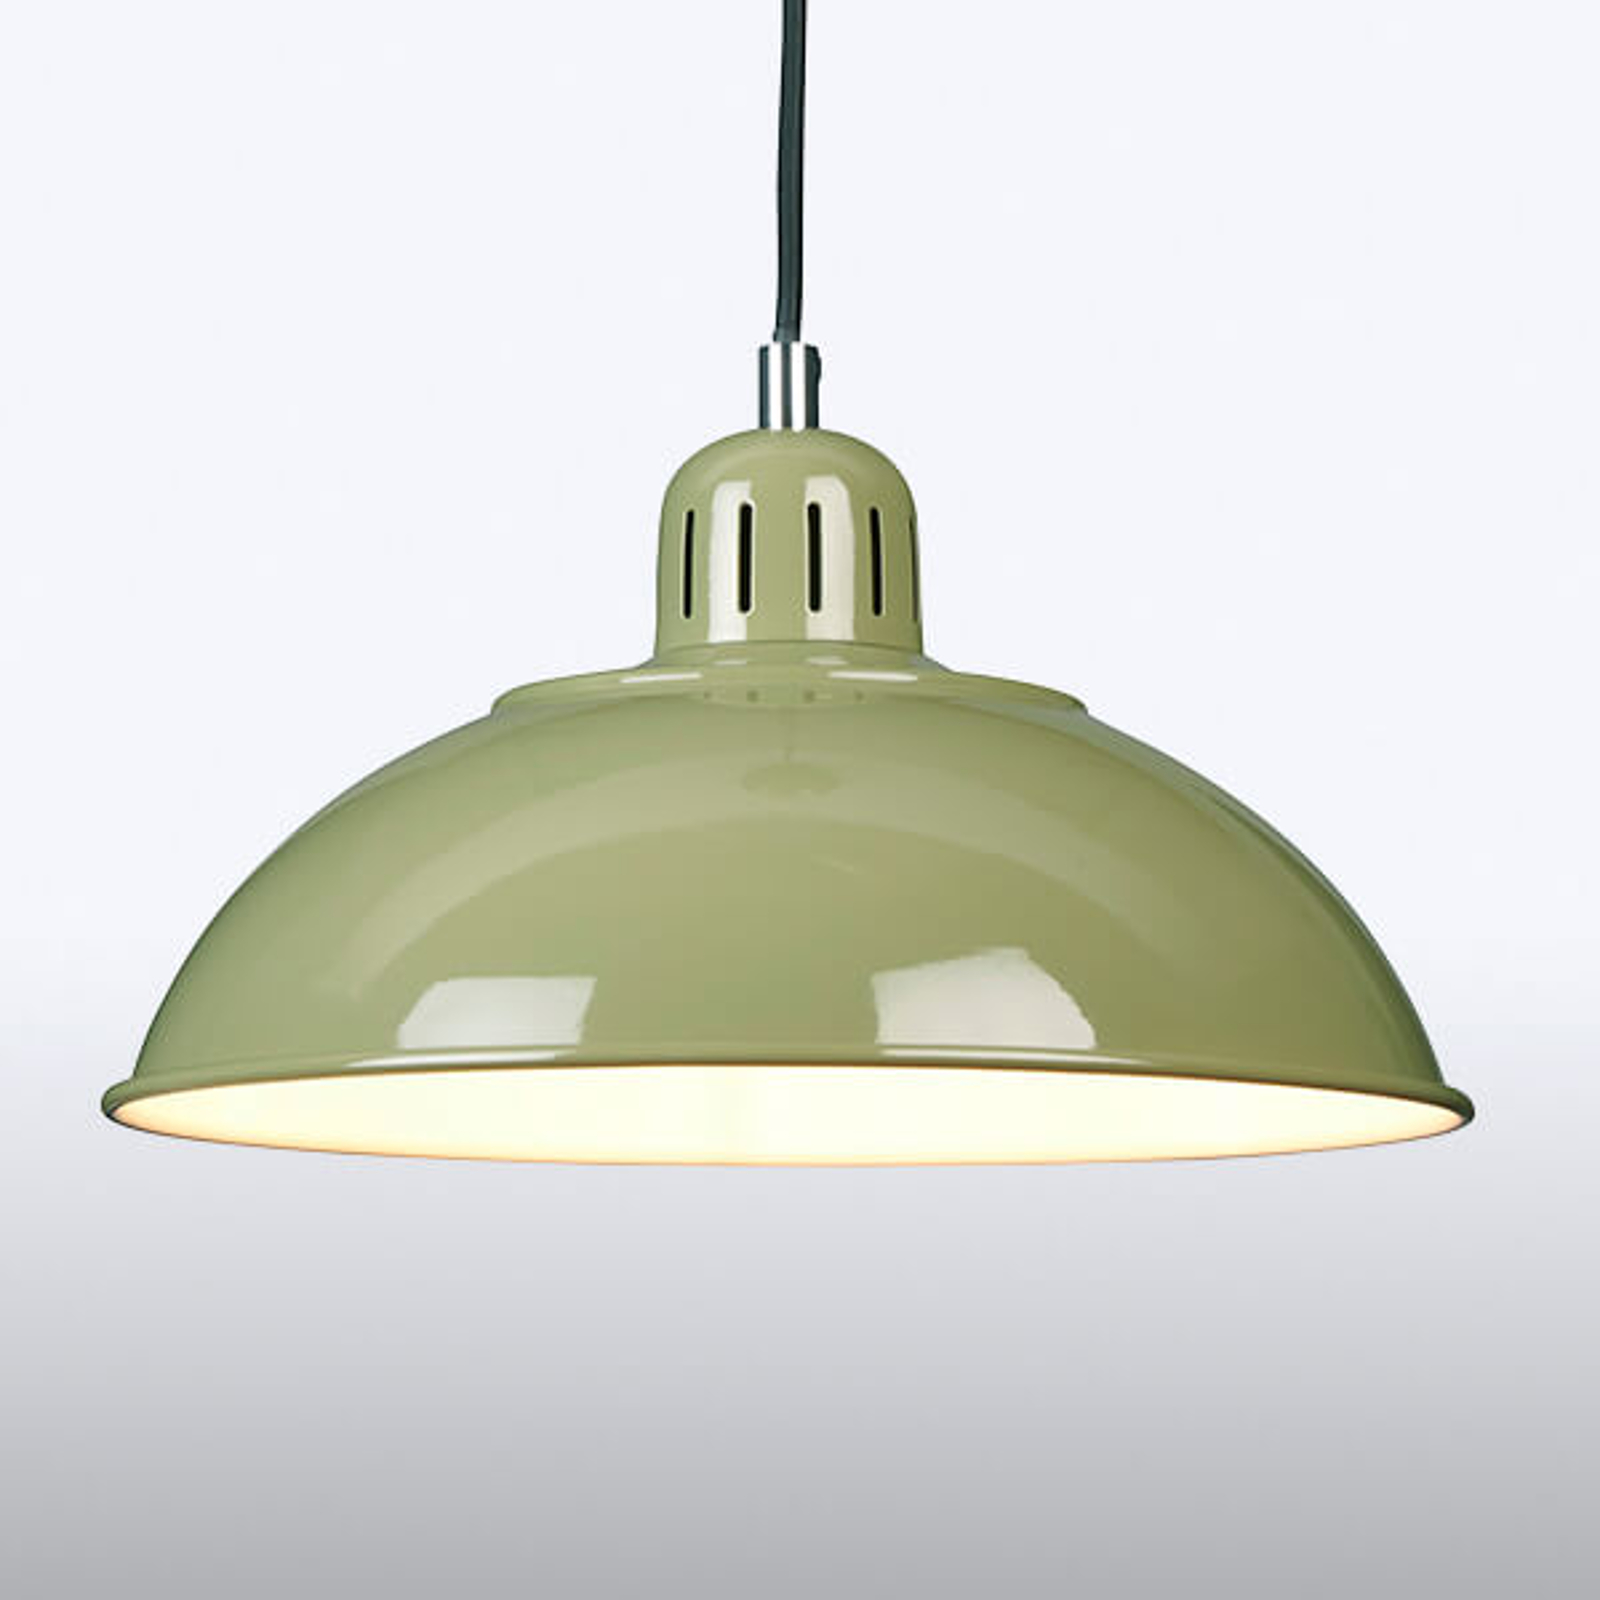 Groene hanglamp Franklin in Retrostijl